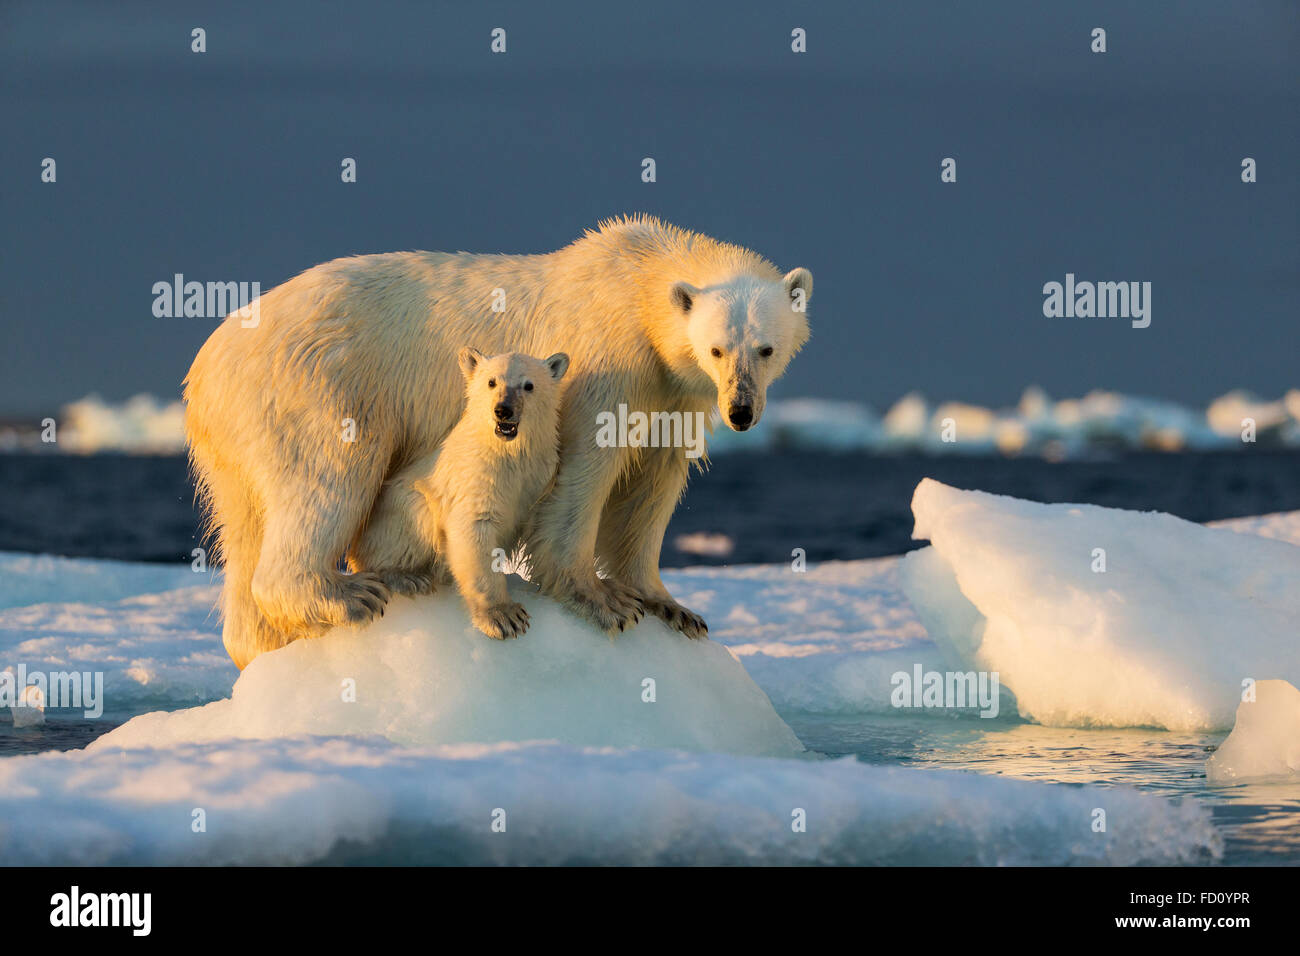 Canada, Nunavut Territory, Repulse Bay, Polar Bear Cub (Ursus maritimus) beneath mother while standing on sea ice - Stock Image